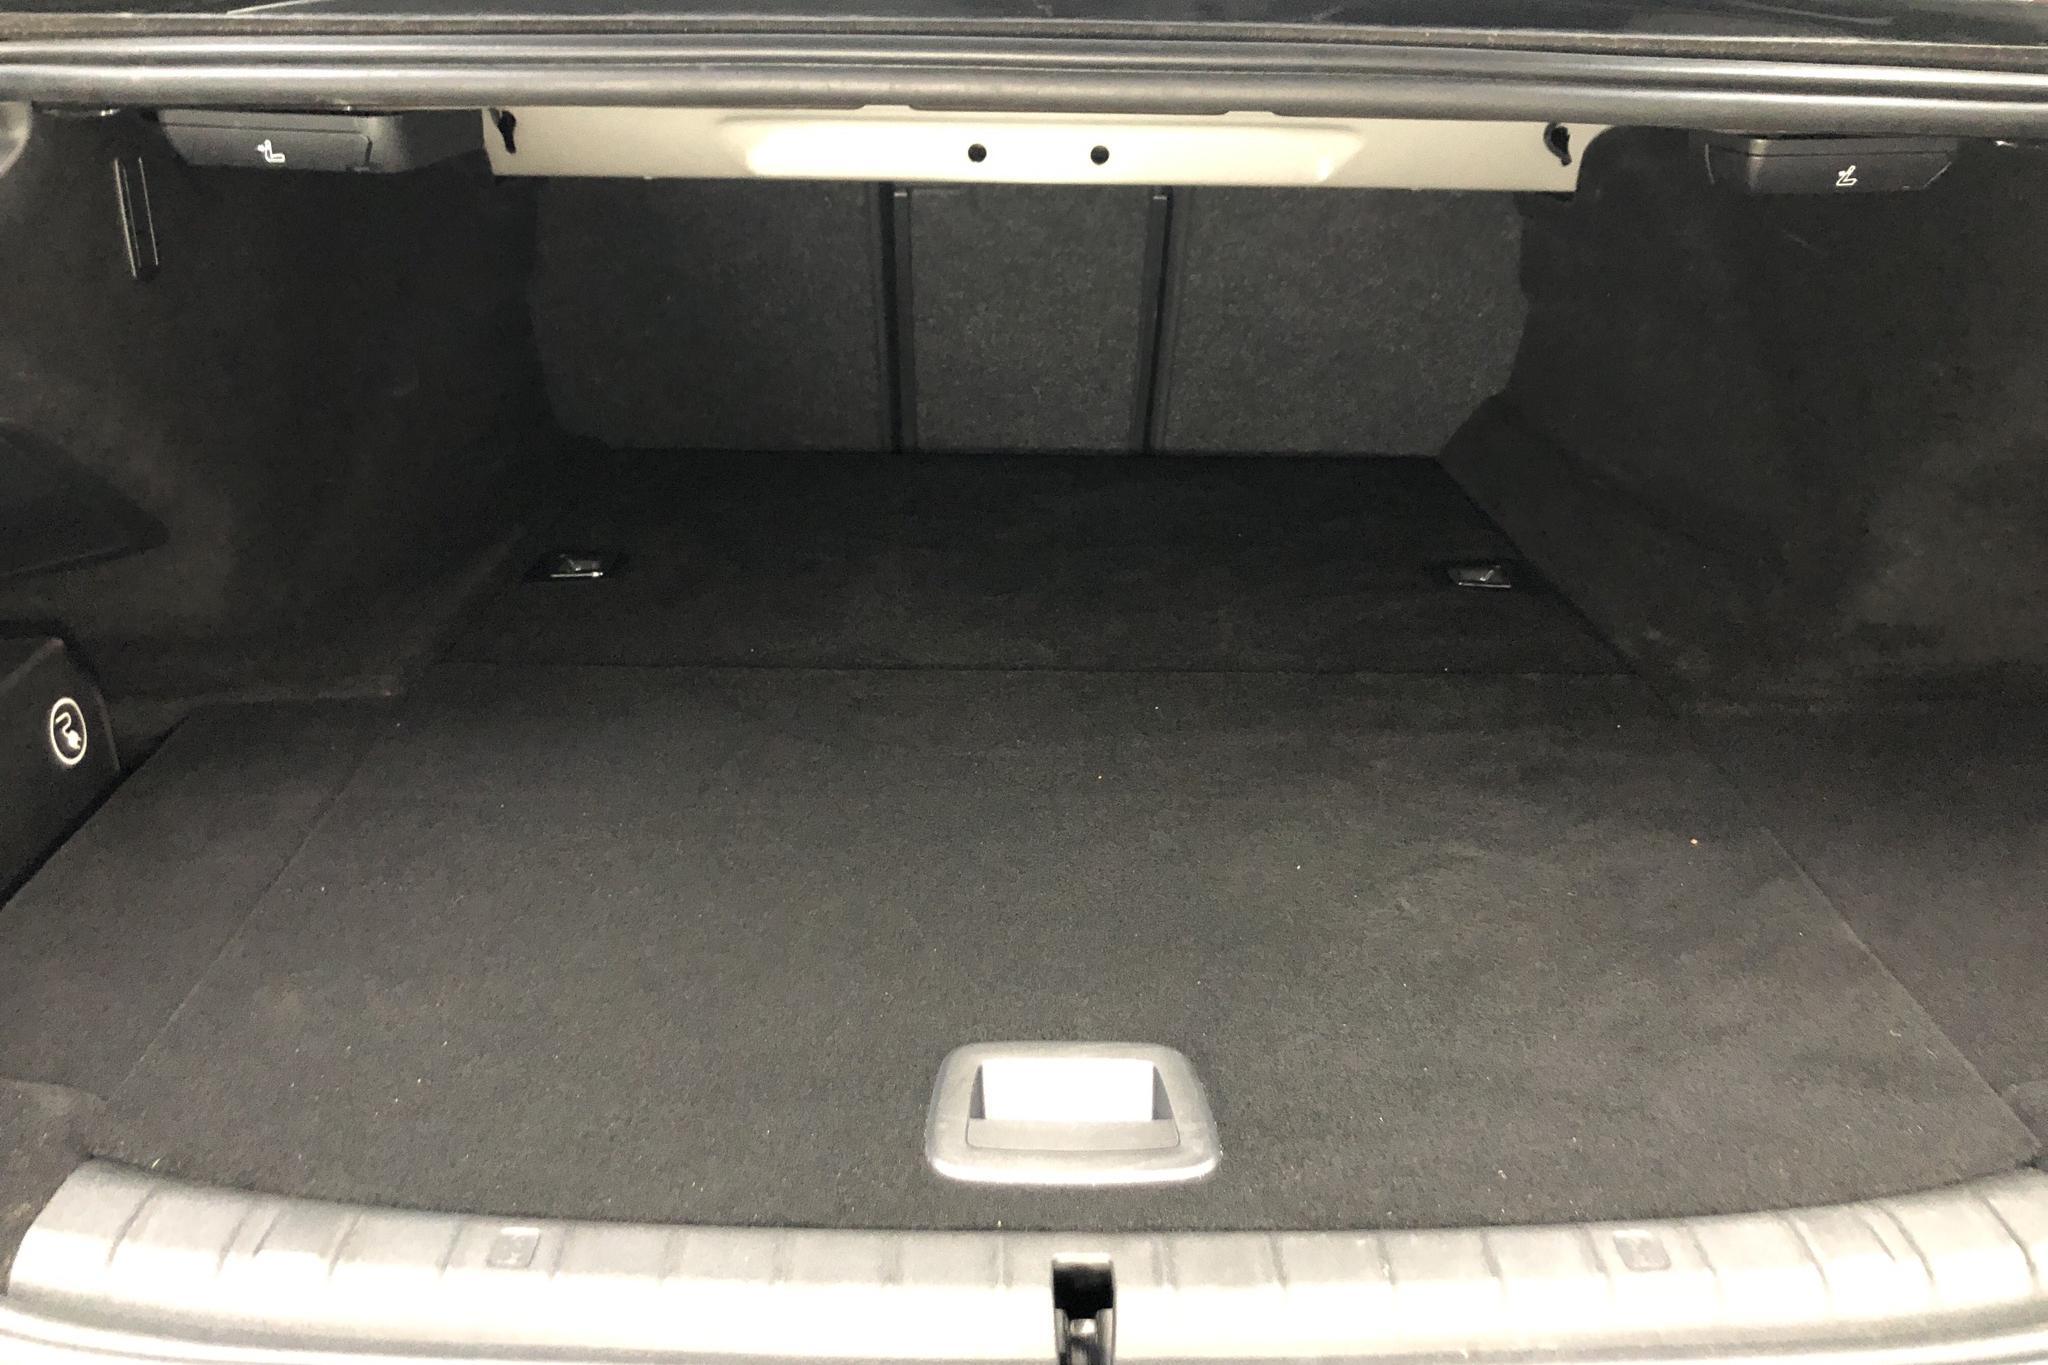 BMW 530e iPerformance Sedan, G30 (252hk) - 111 120 km - Automatic - gray - 2019